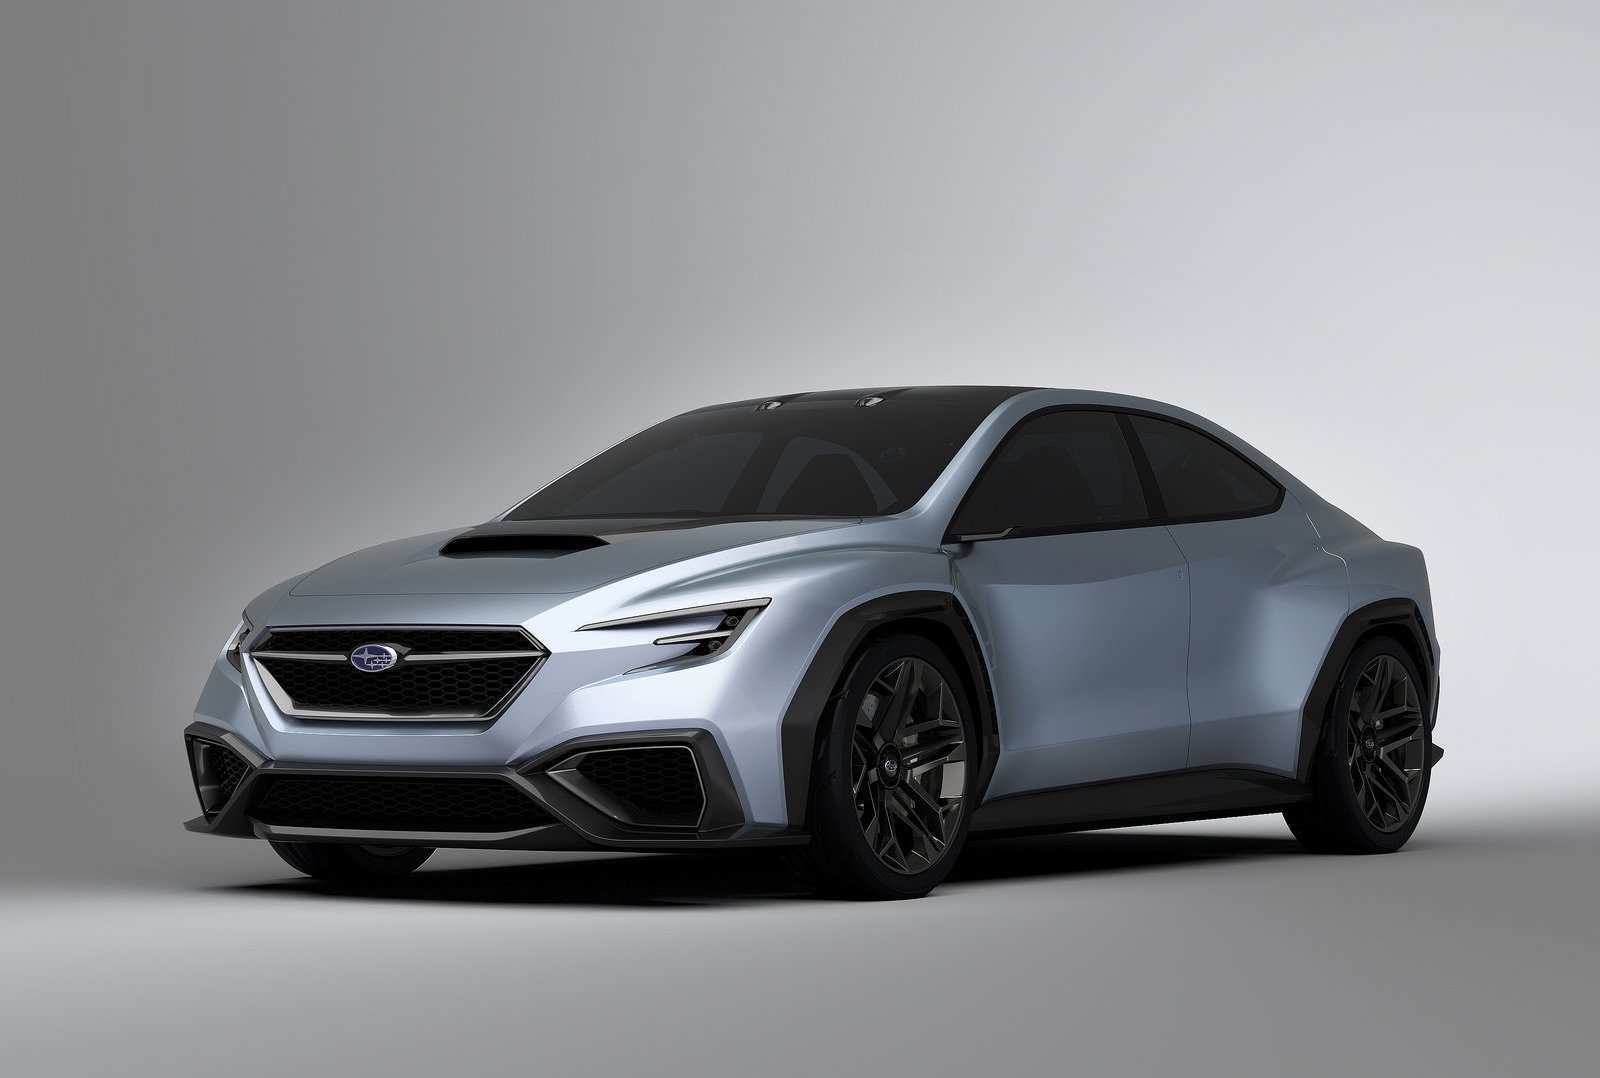 88 Concept of Subaru Impreza Hybrid 2020 Configurations with Subaru Impreza Hybrid 2020